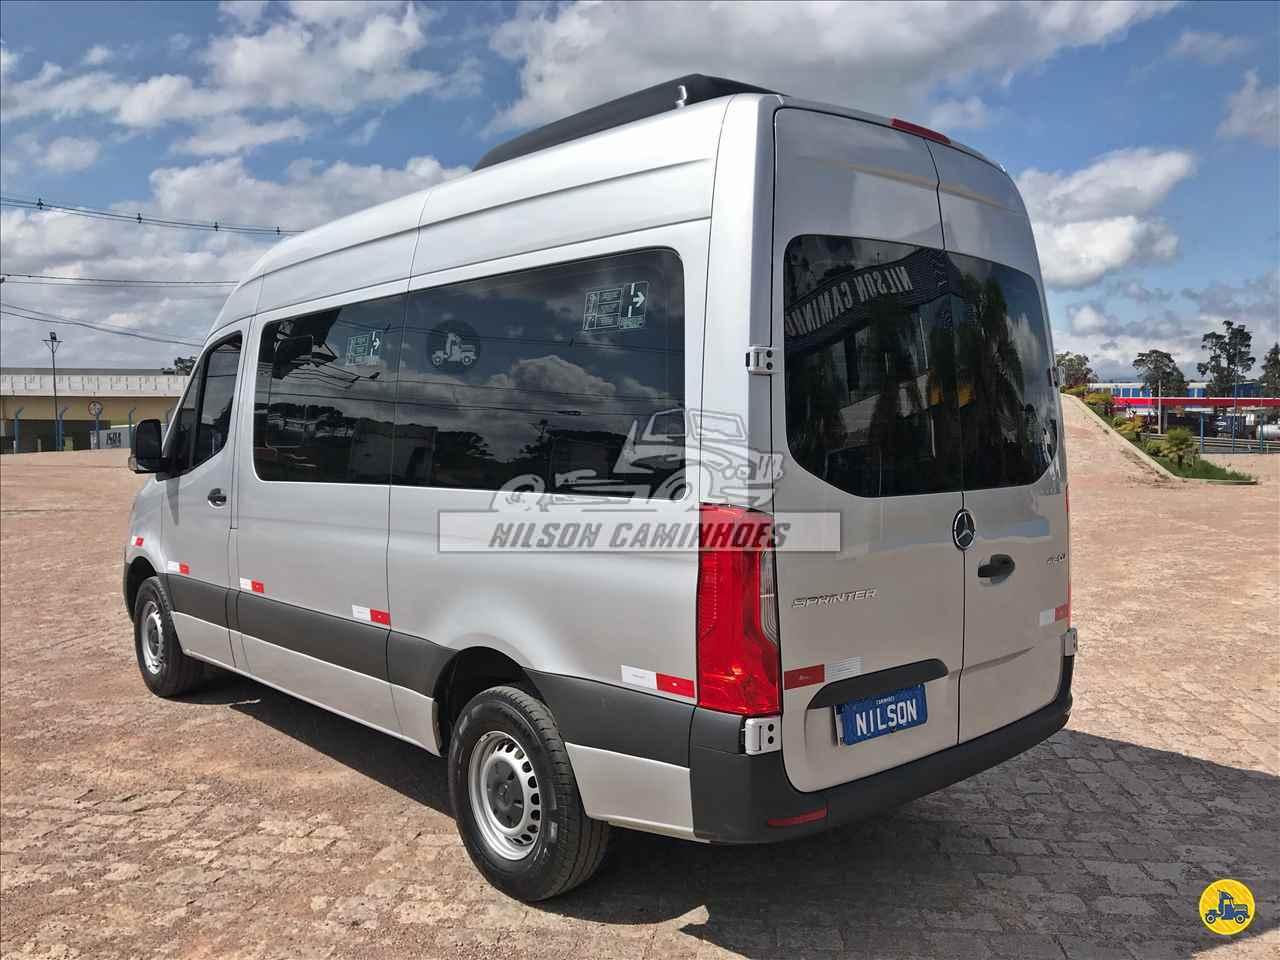 MERCEDES-BENZ Sprinter VAN 416 19000km 2019/2020 Nilson Caminhoes